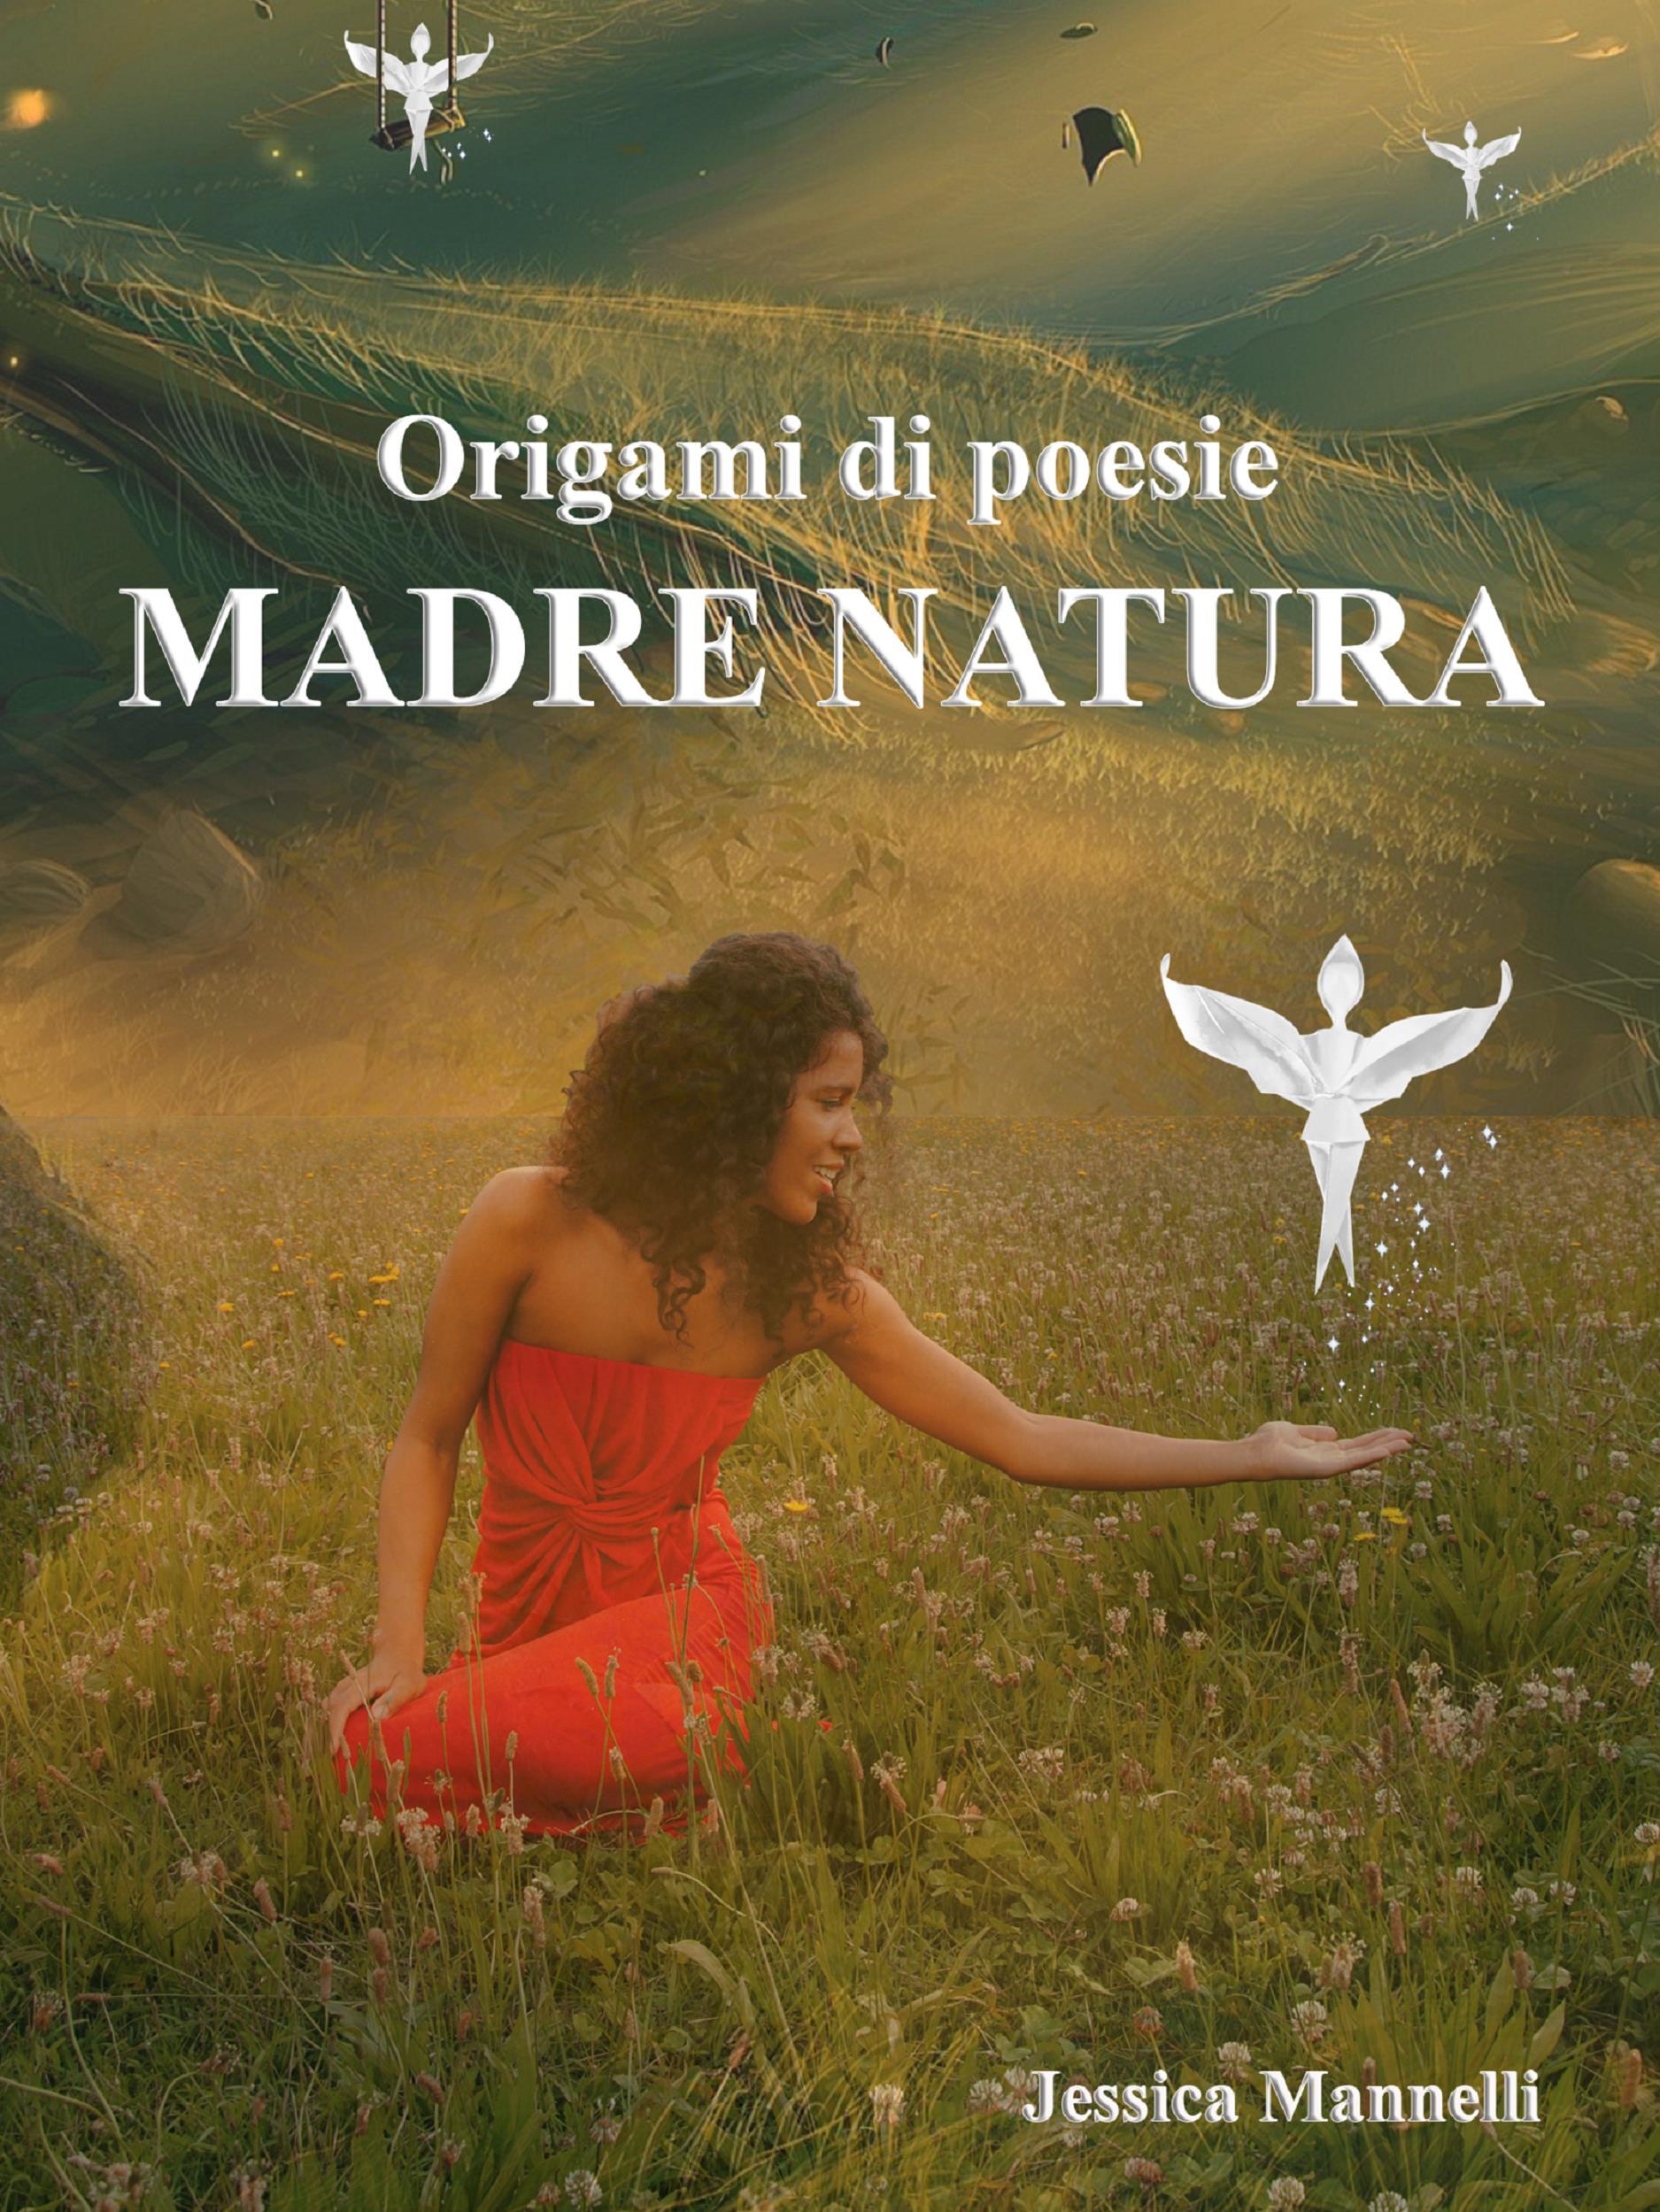 Origami di poesia - Madre natura